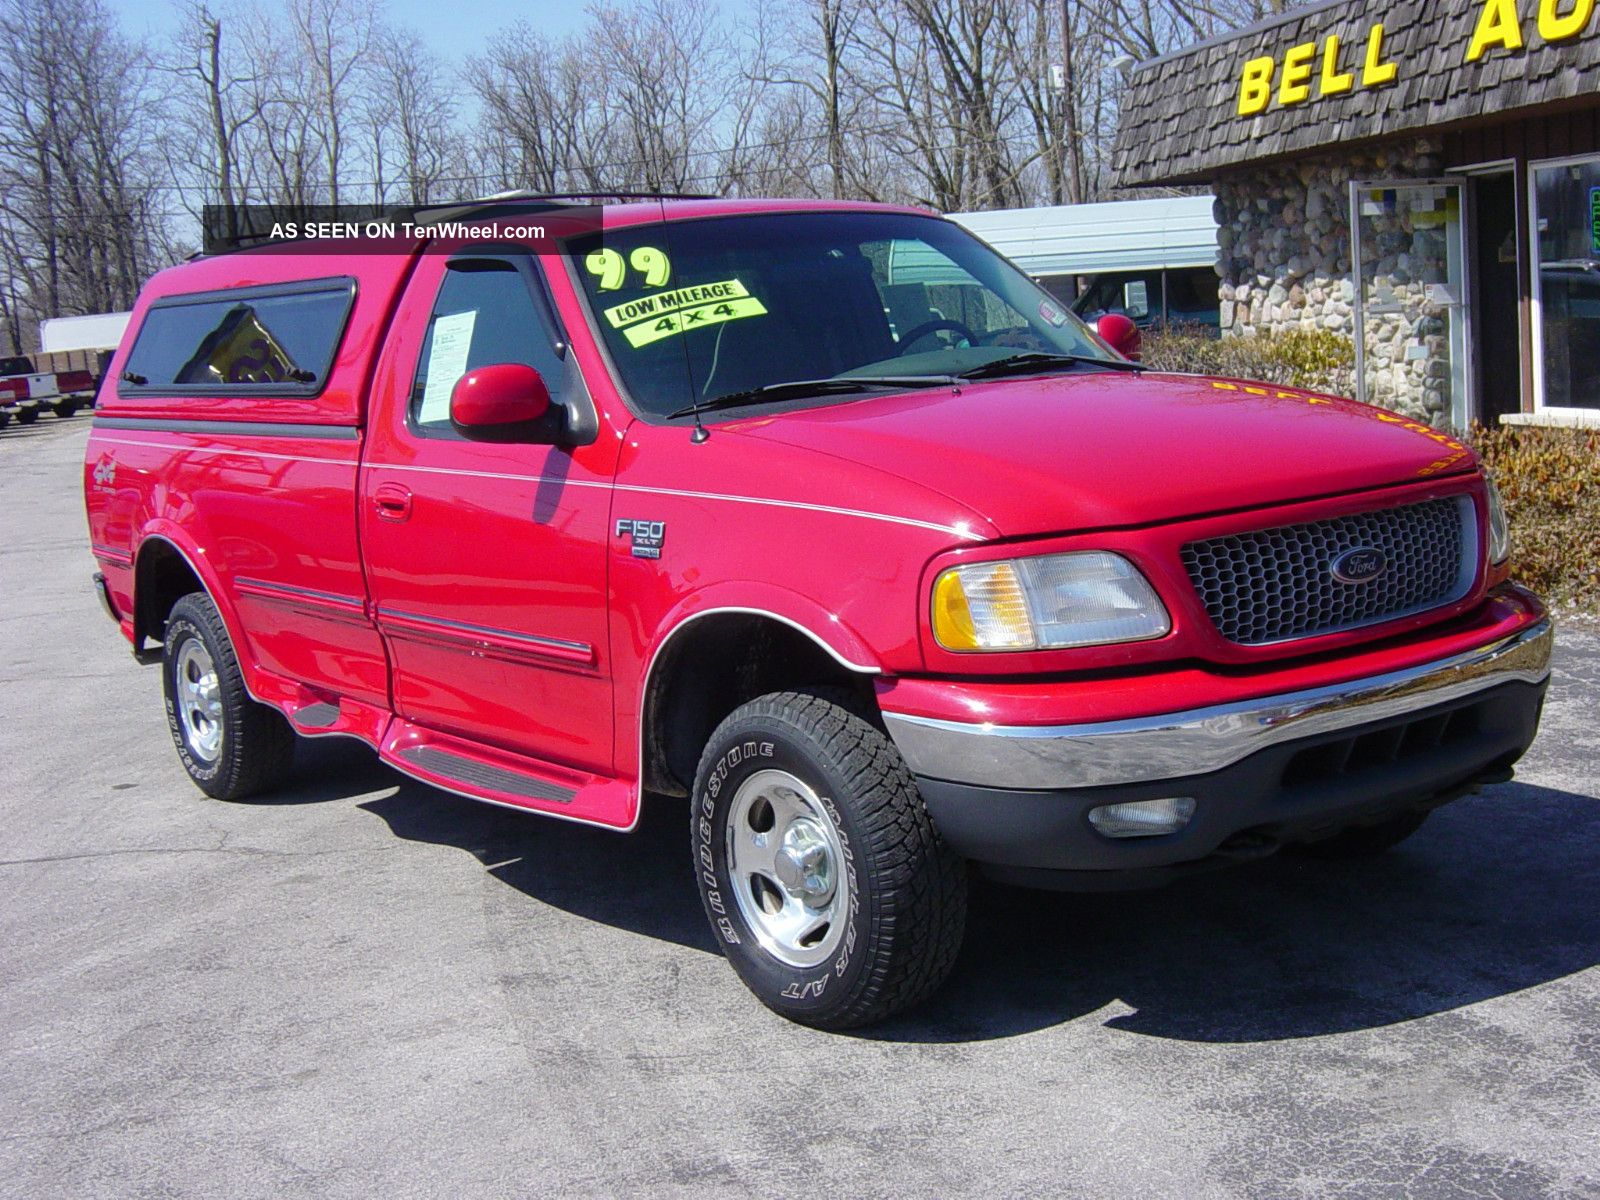 1999 ford f 150 xlt standard cab pickup 2 door 5 4l 4x4 bright red. Black Bedroom Furniture Sets. Home Design Ideas